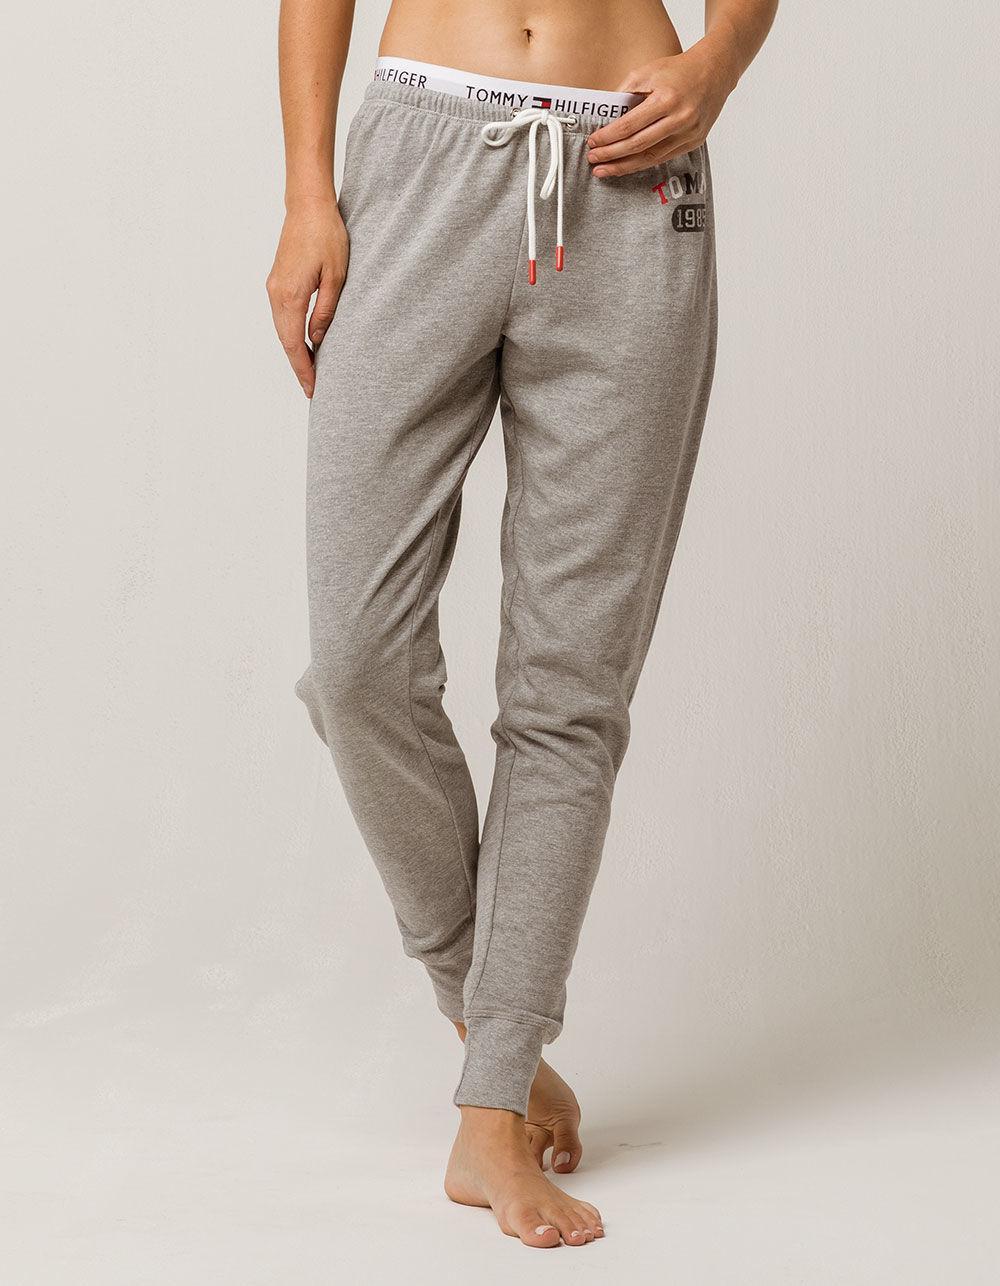 16d310c6d773f Tommy Hilfiger Jogger Womens Sweatpants in Gray - Lyst